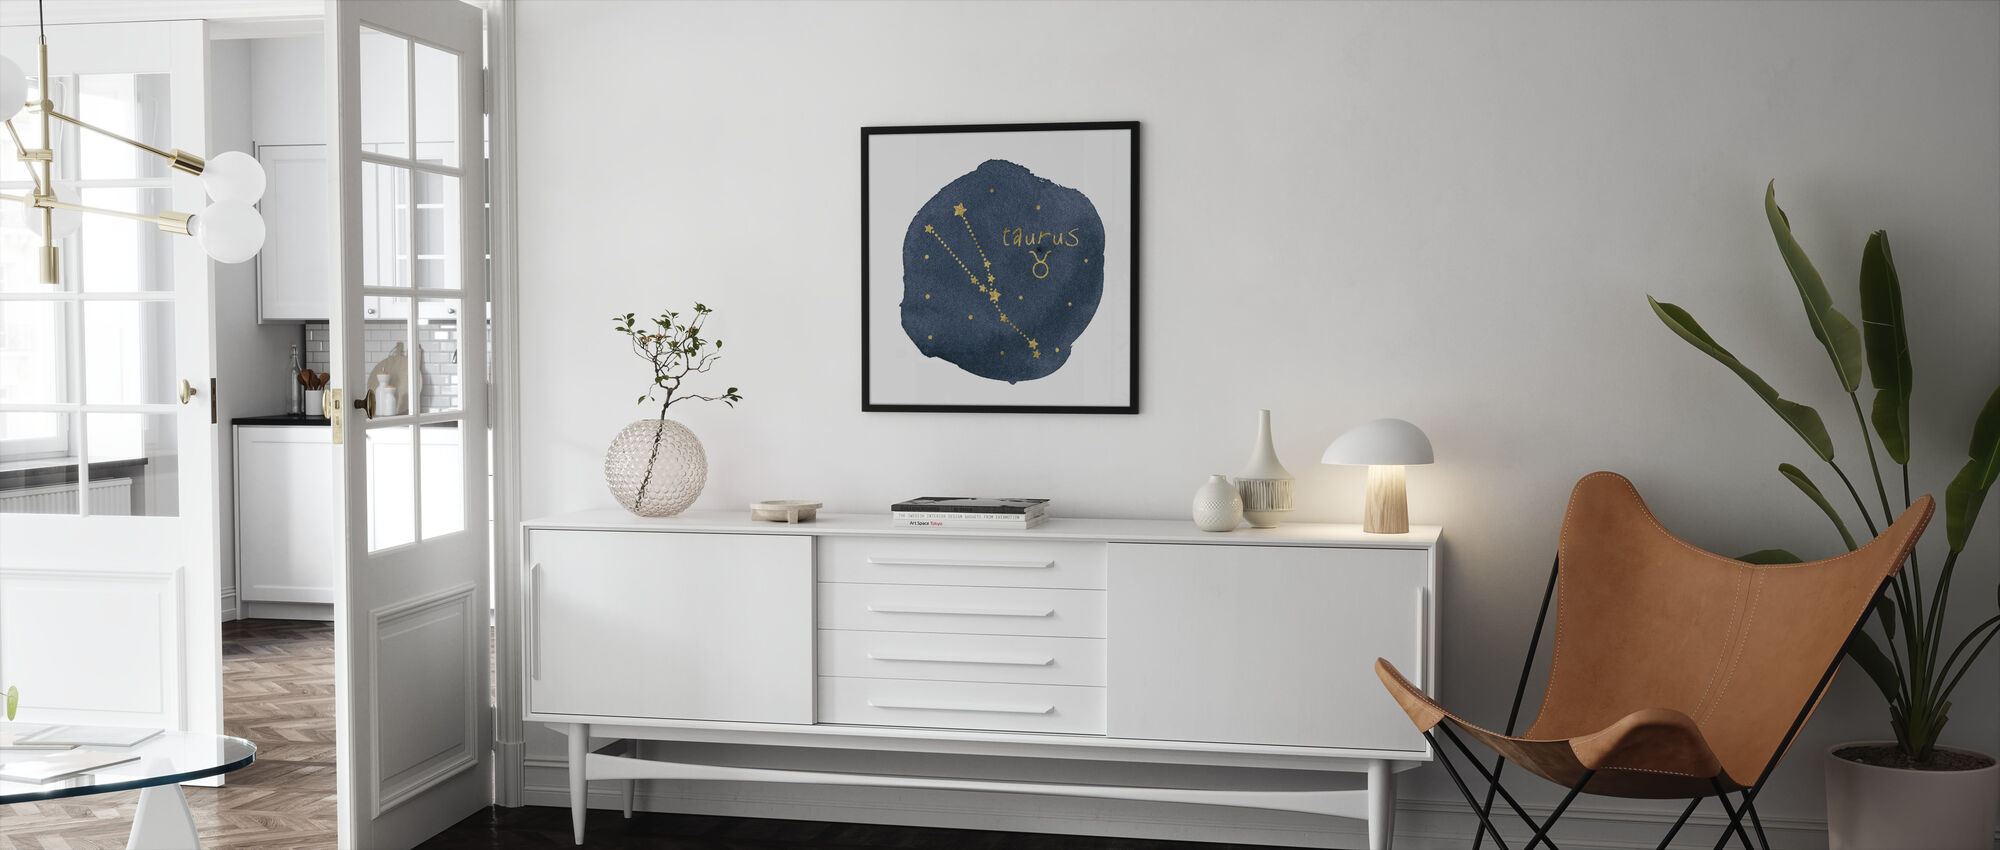 Horoskop Taurus - Innrammet bilde - Stue